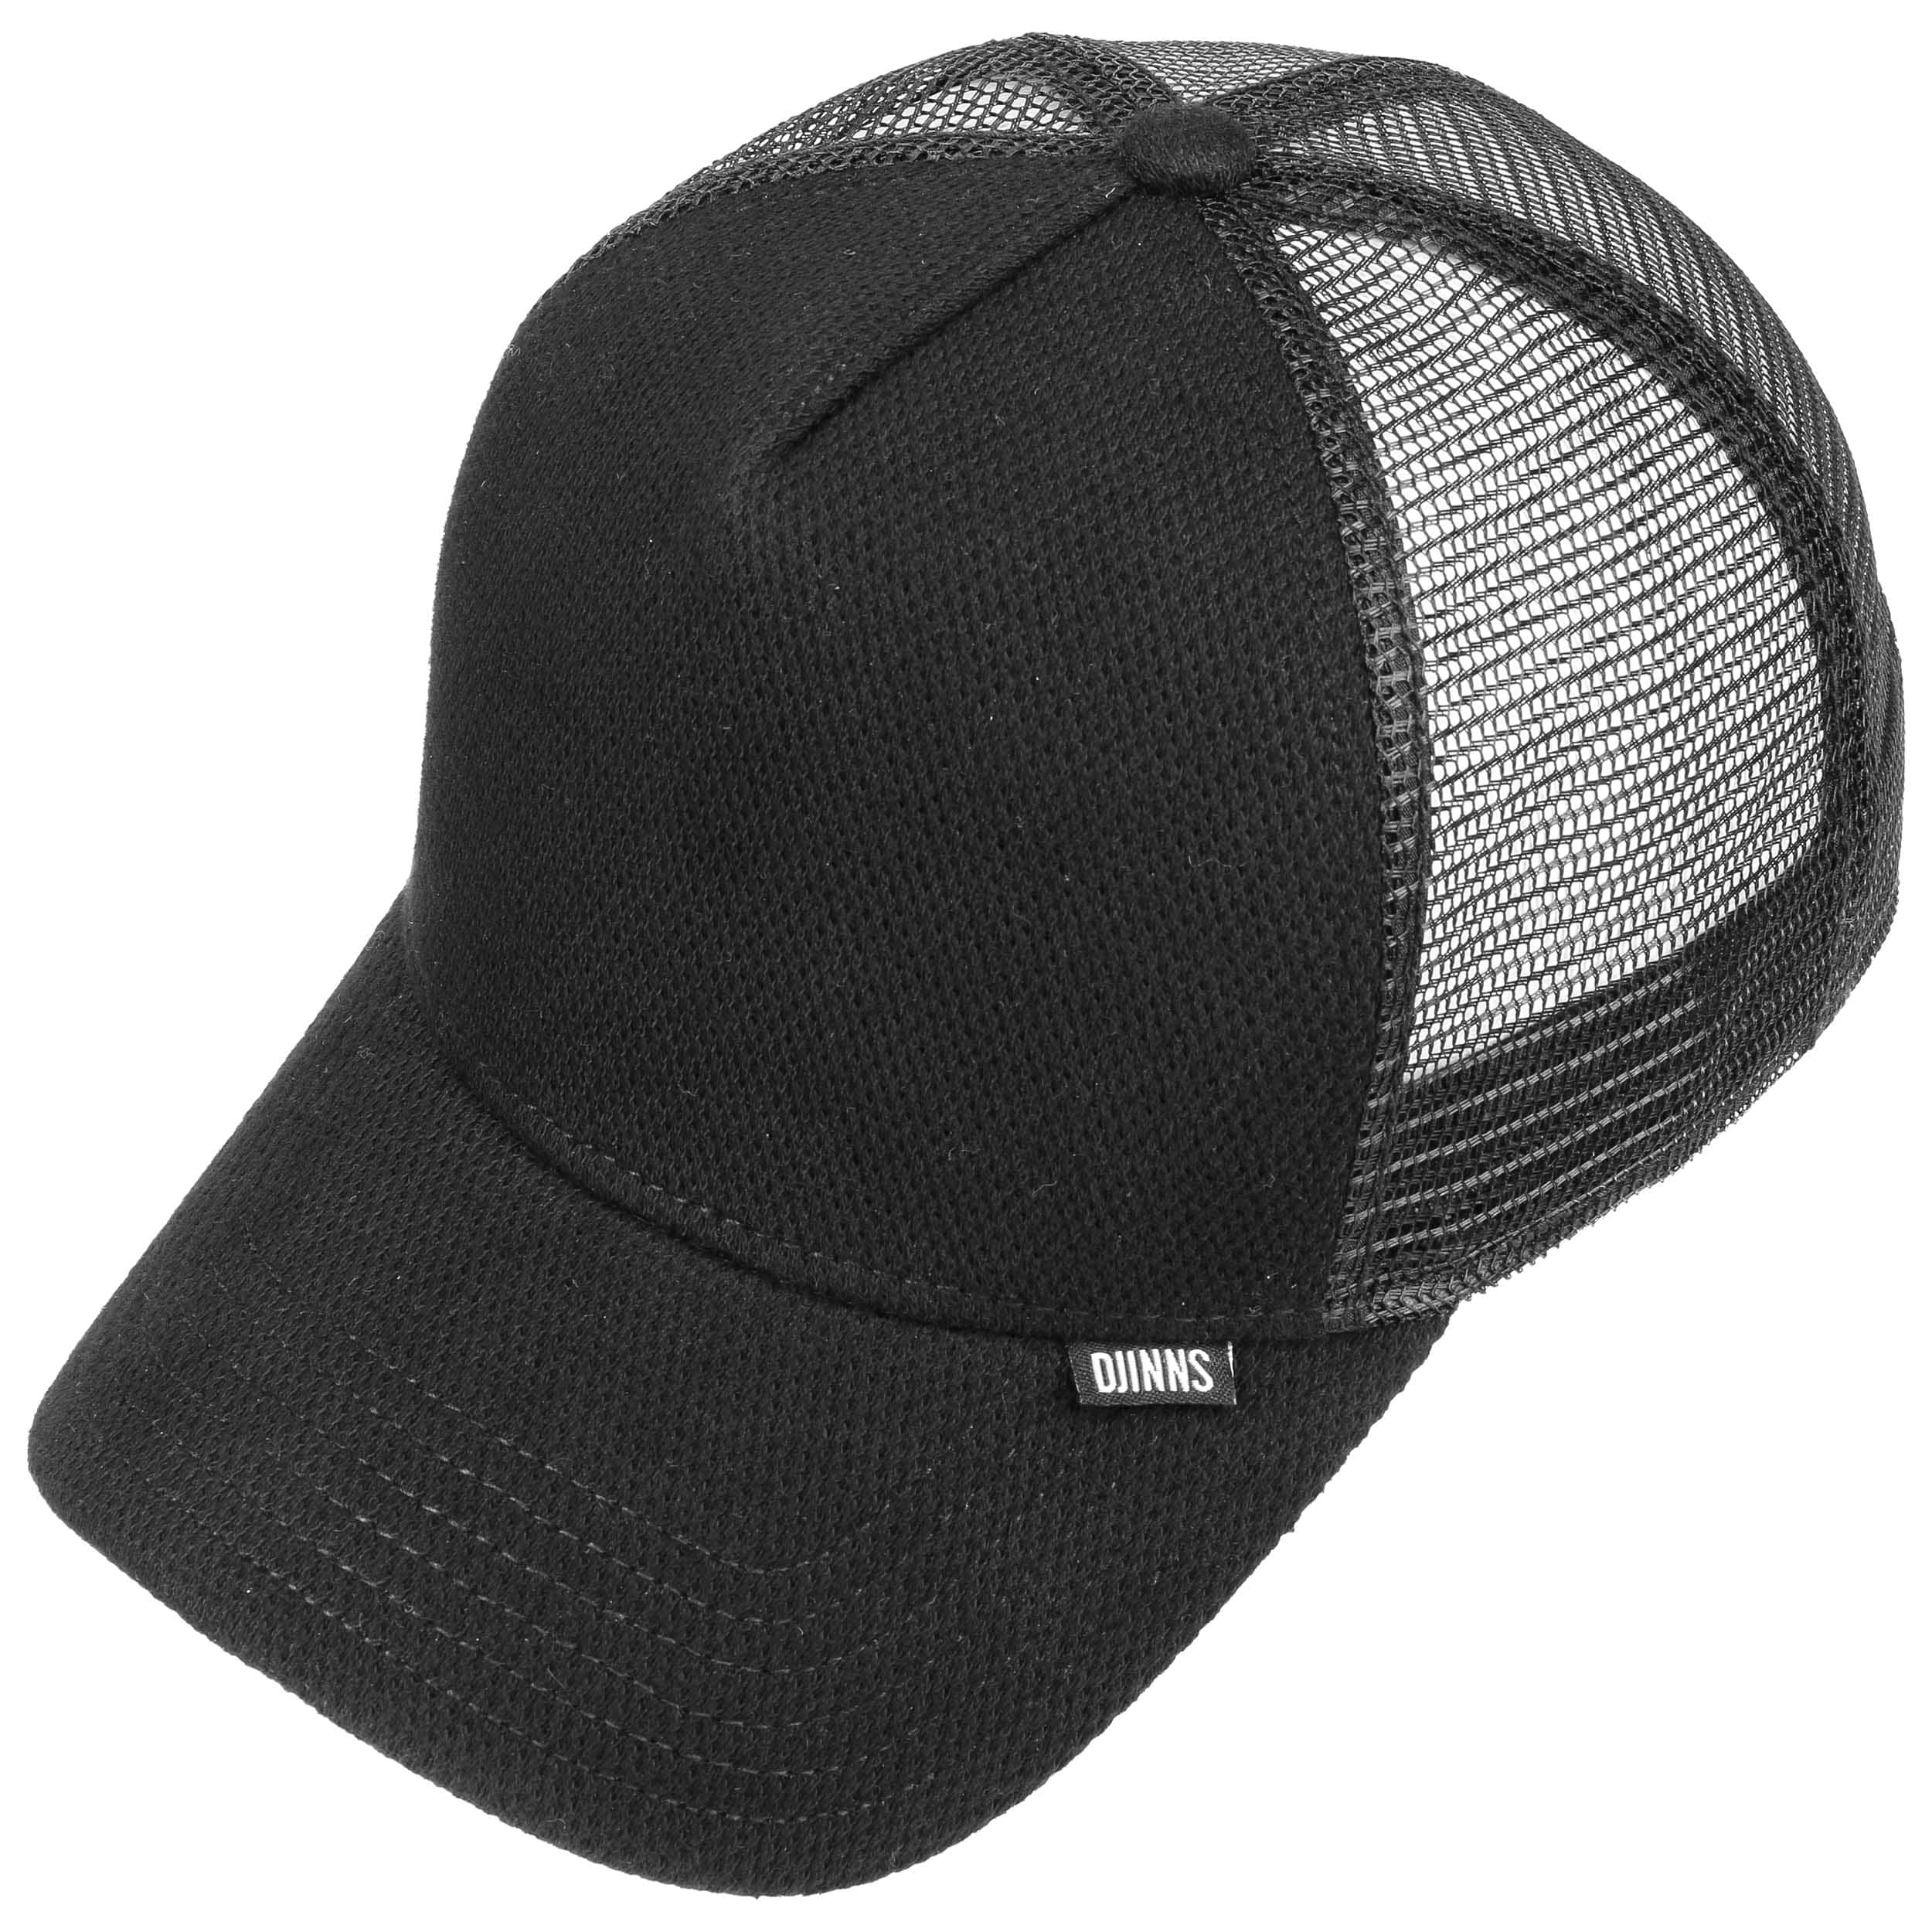 piki hft trucker cap by djinns gbp 22 95 hats caps. Black Bedroom Furniture Sets. Home Design Ideas